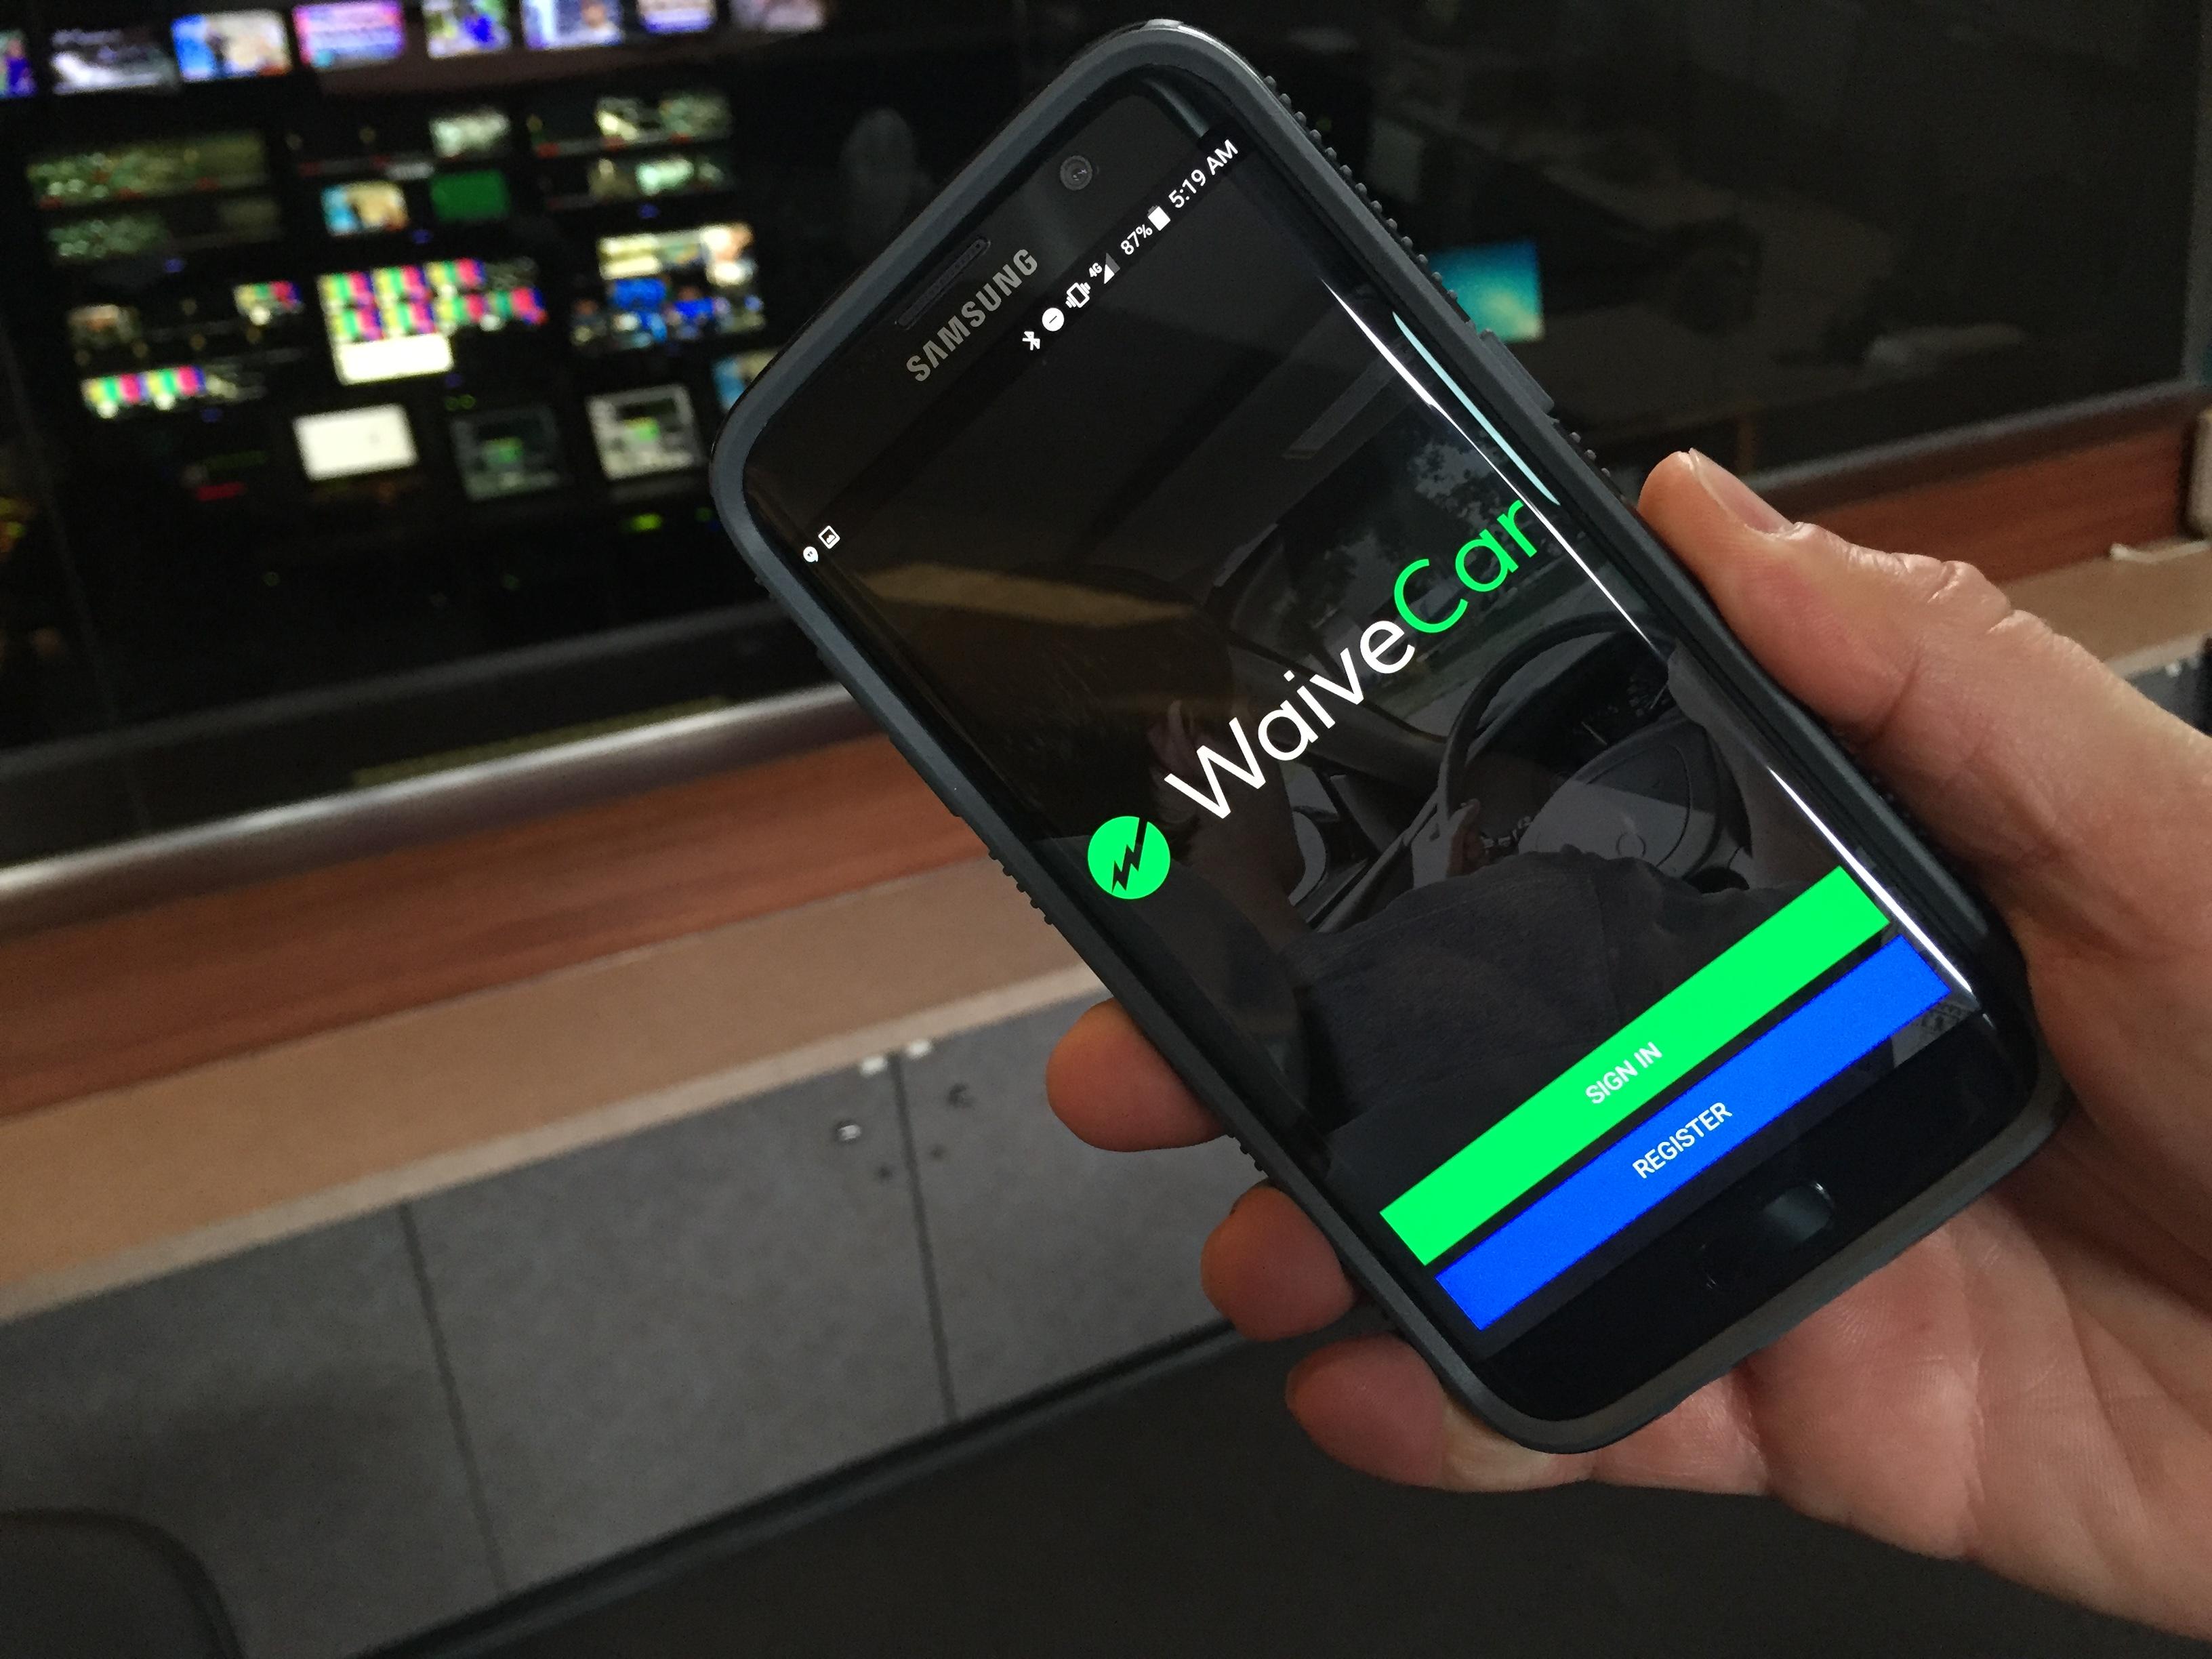 waivecar app